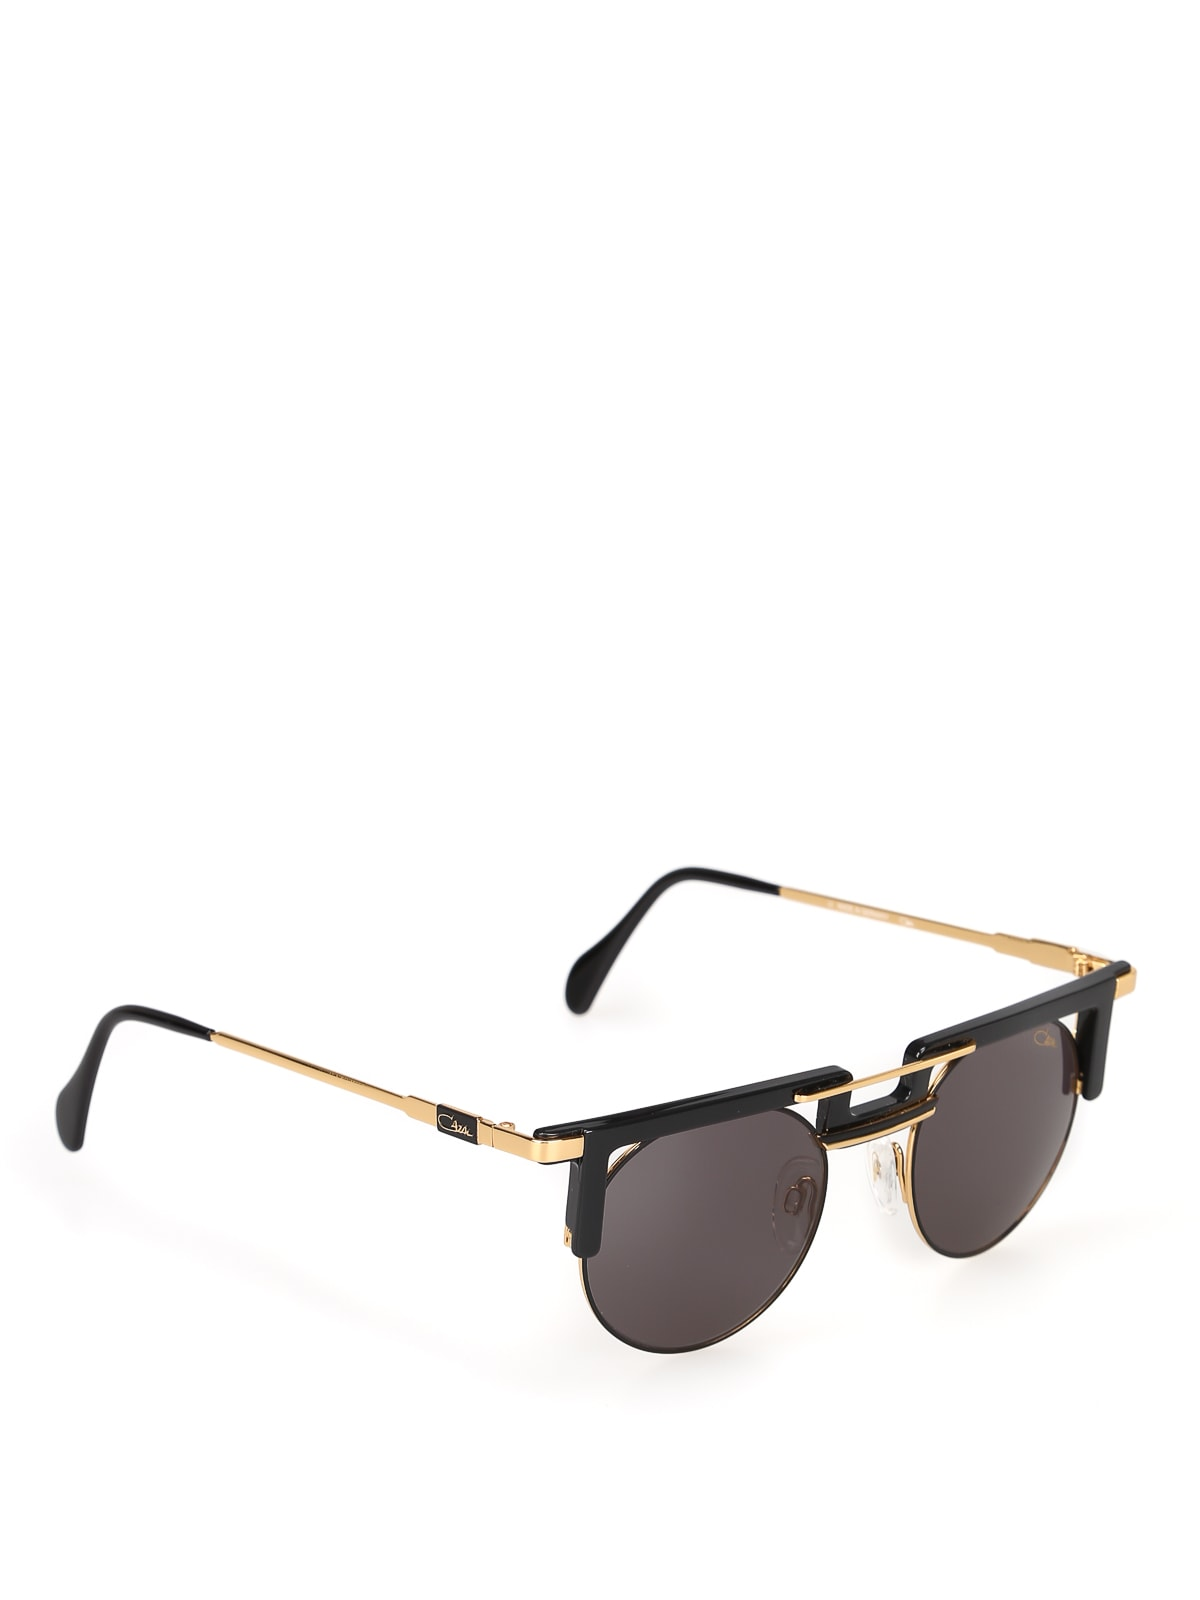 745/3 Sunglasses